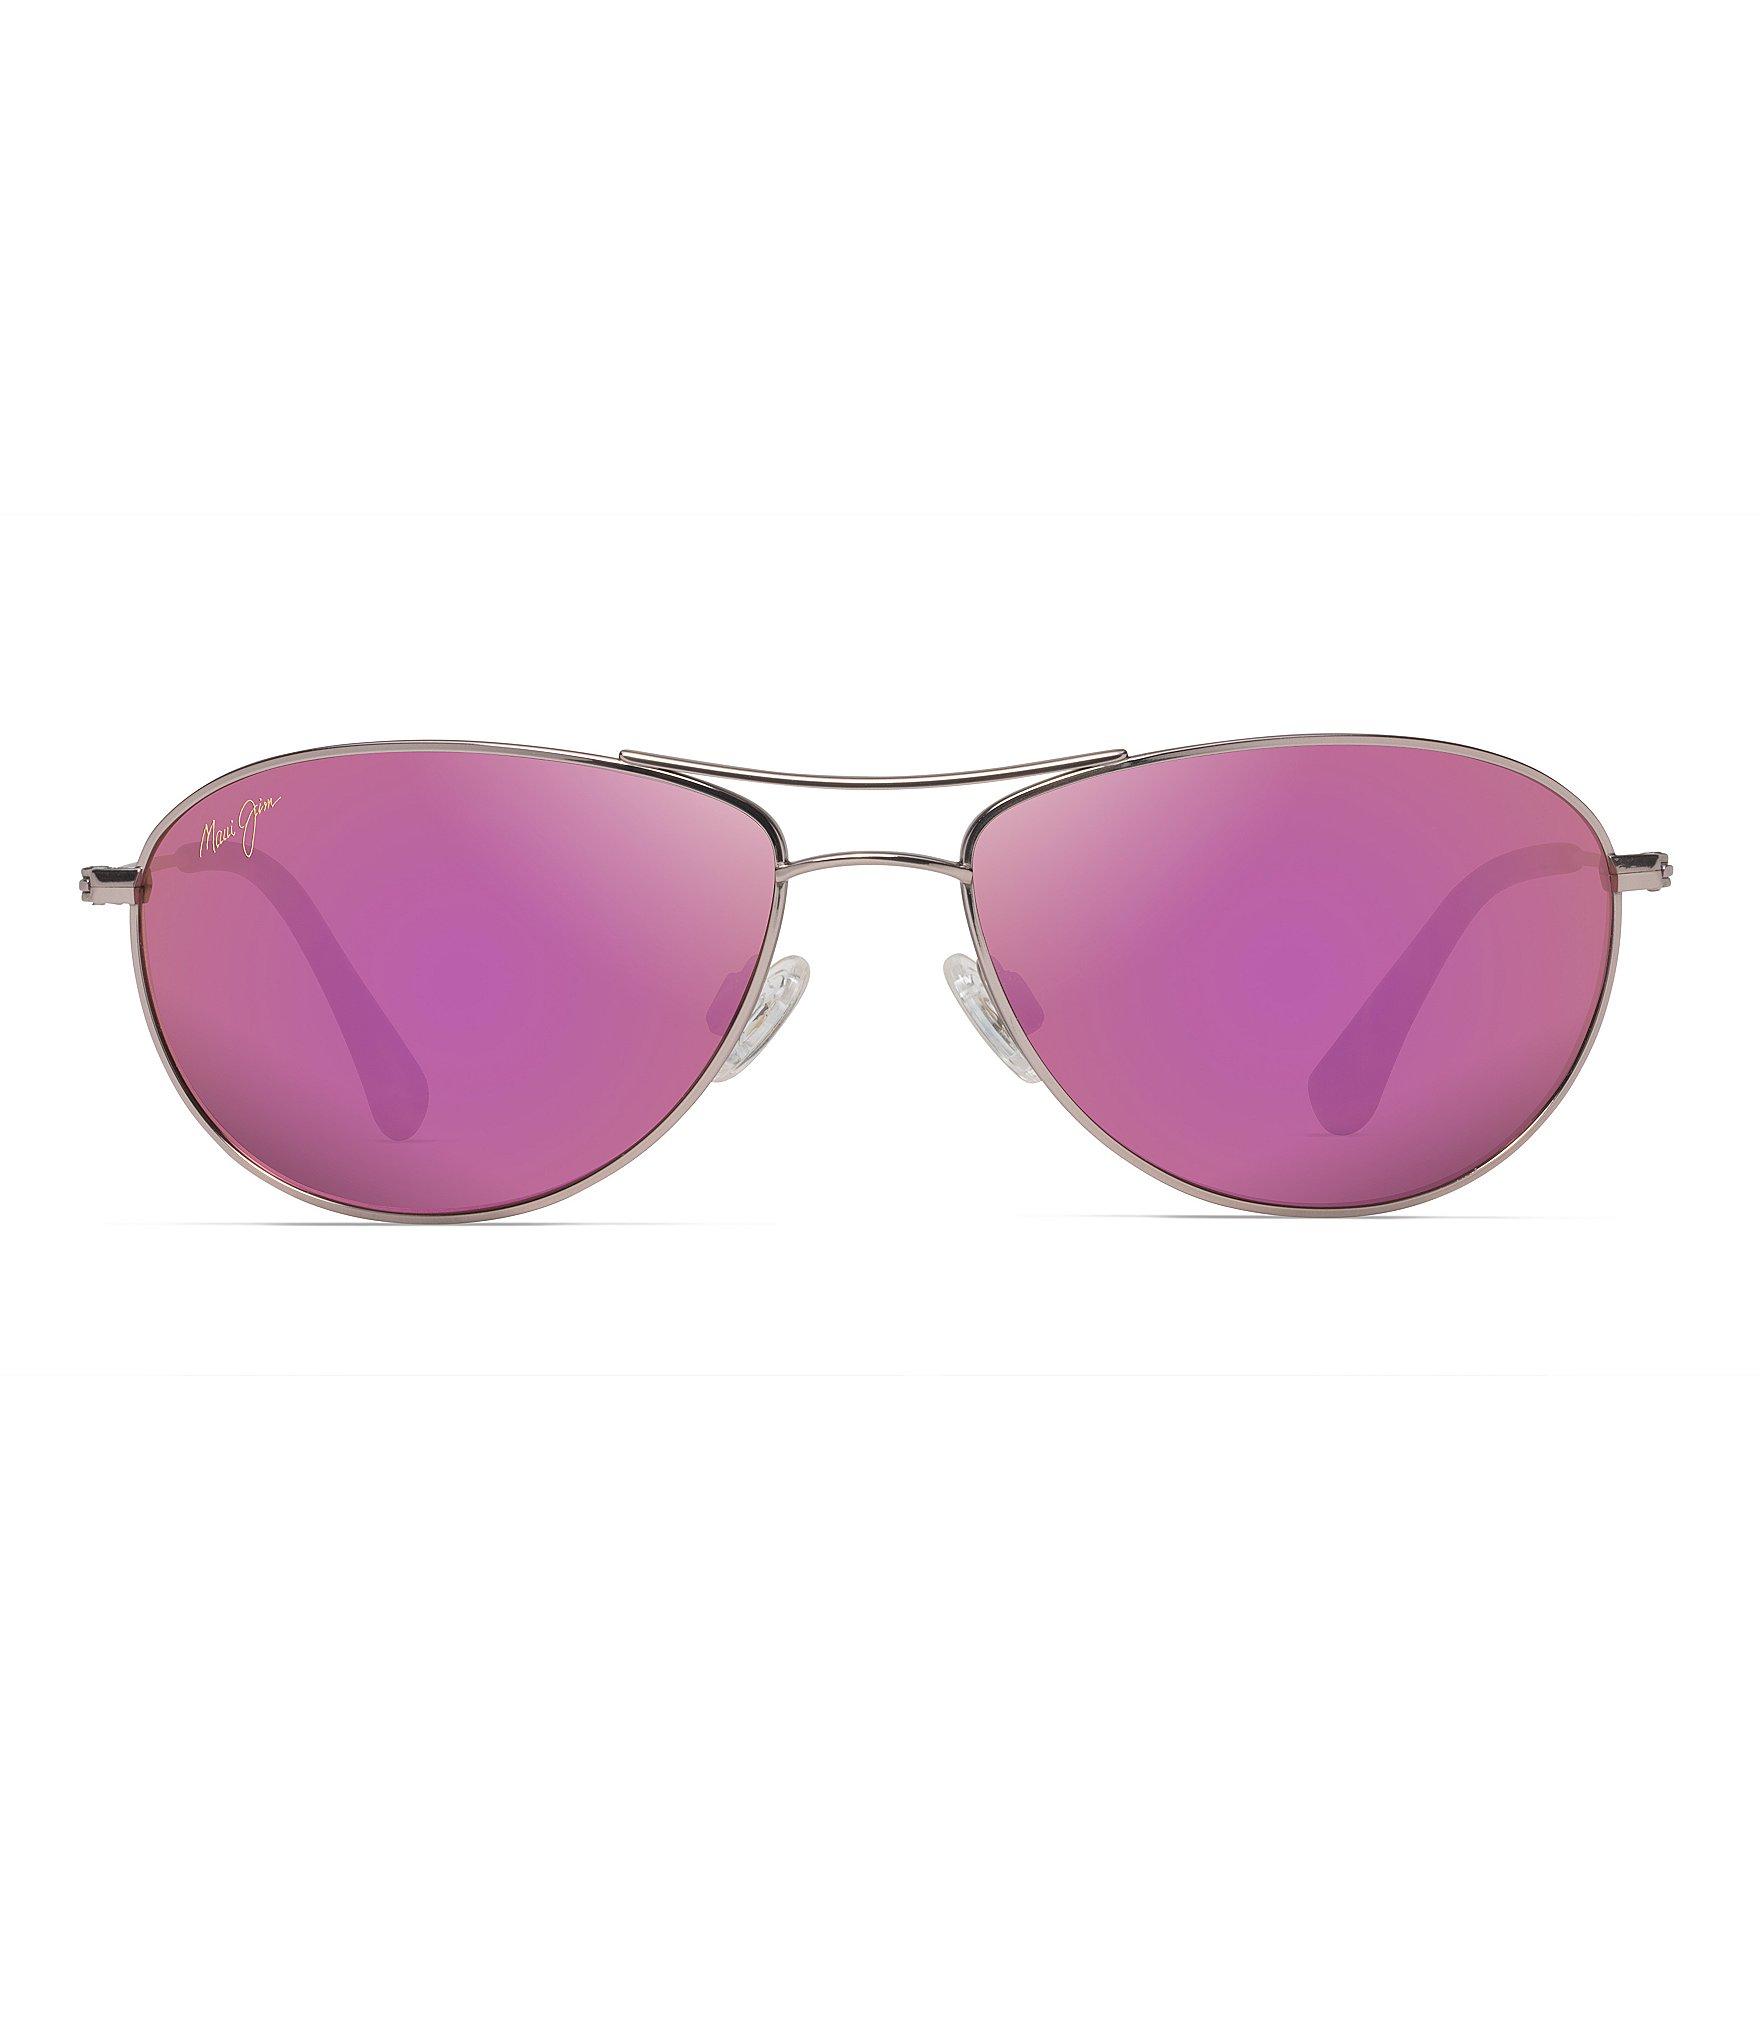 Maui Jim Mirrored Polarized Beach Aviator Baby Sunglasses Qshrdt